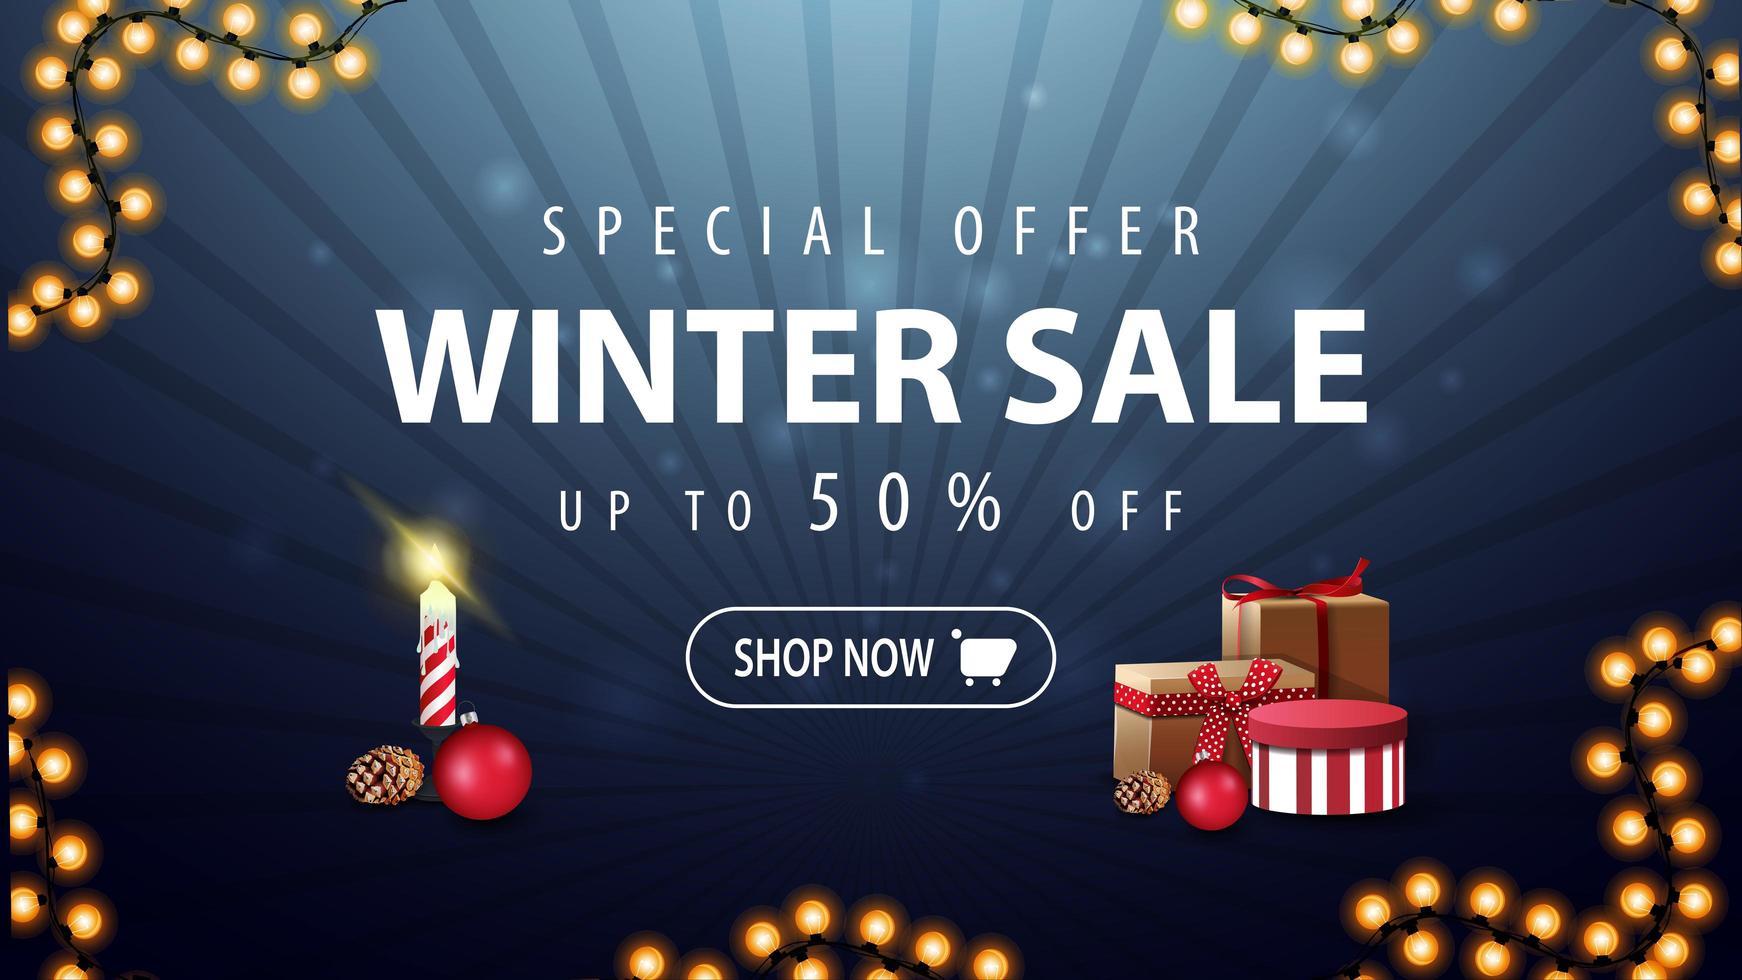 venta de invierno, banner de descuento azul oscuro vector